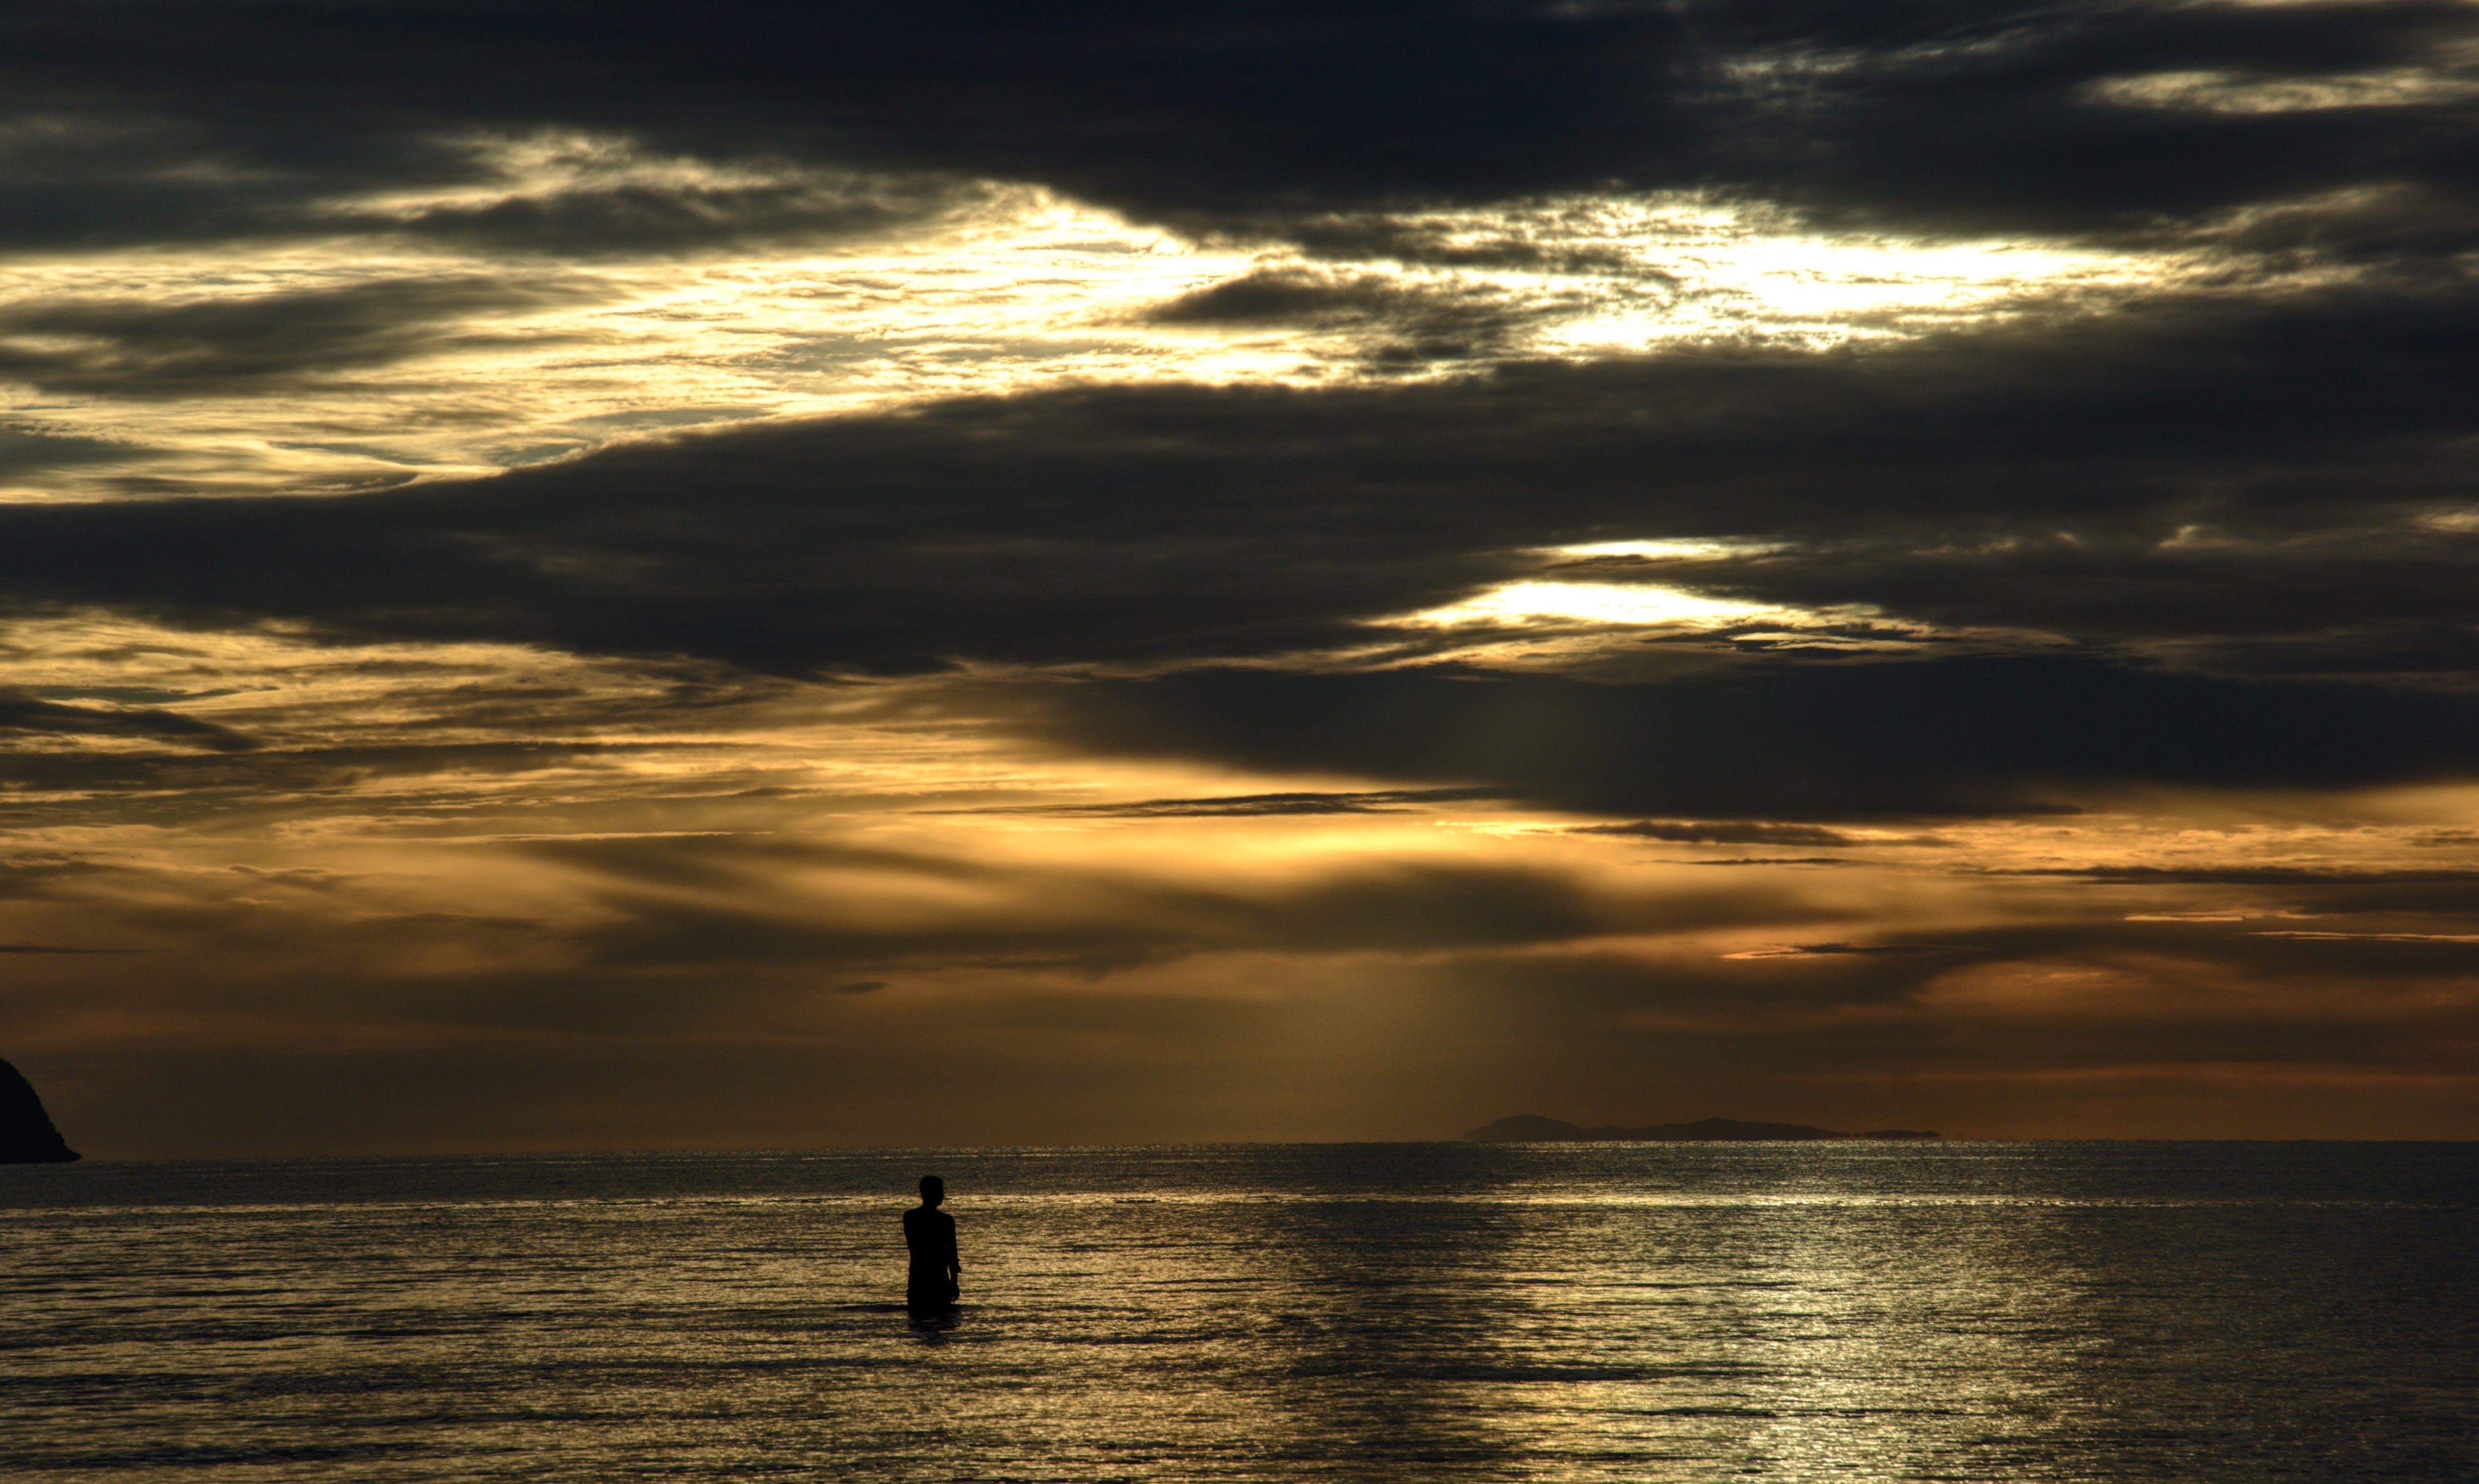 Free stock photo of beach, golden, golden sky, Lightreflection